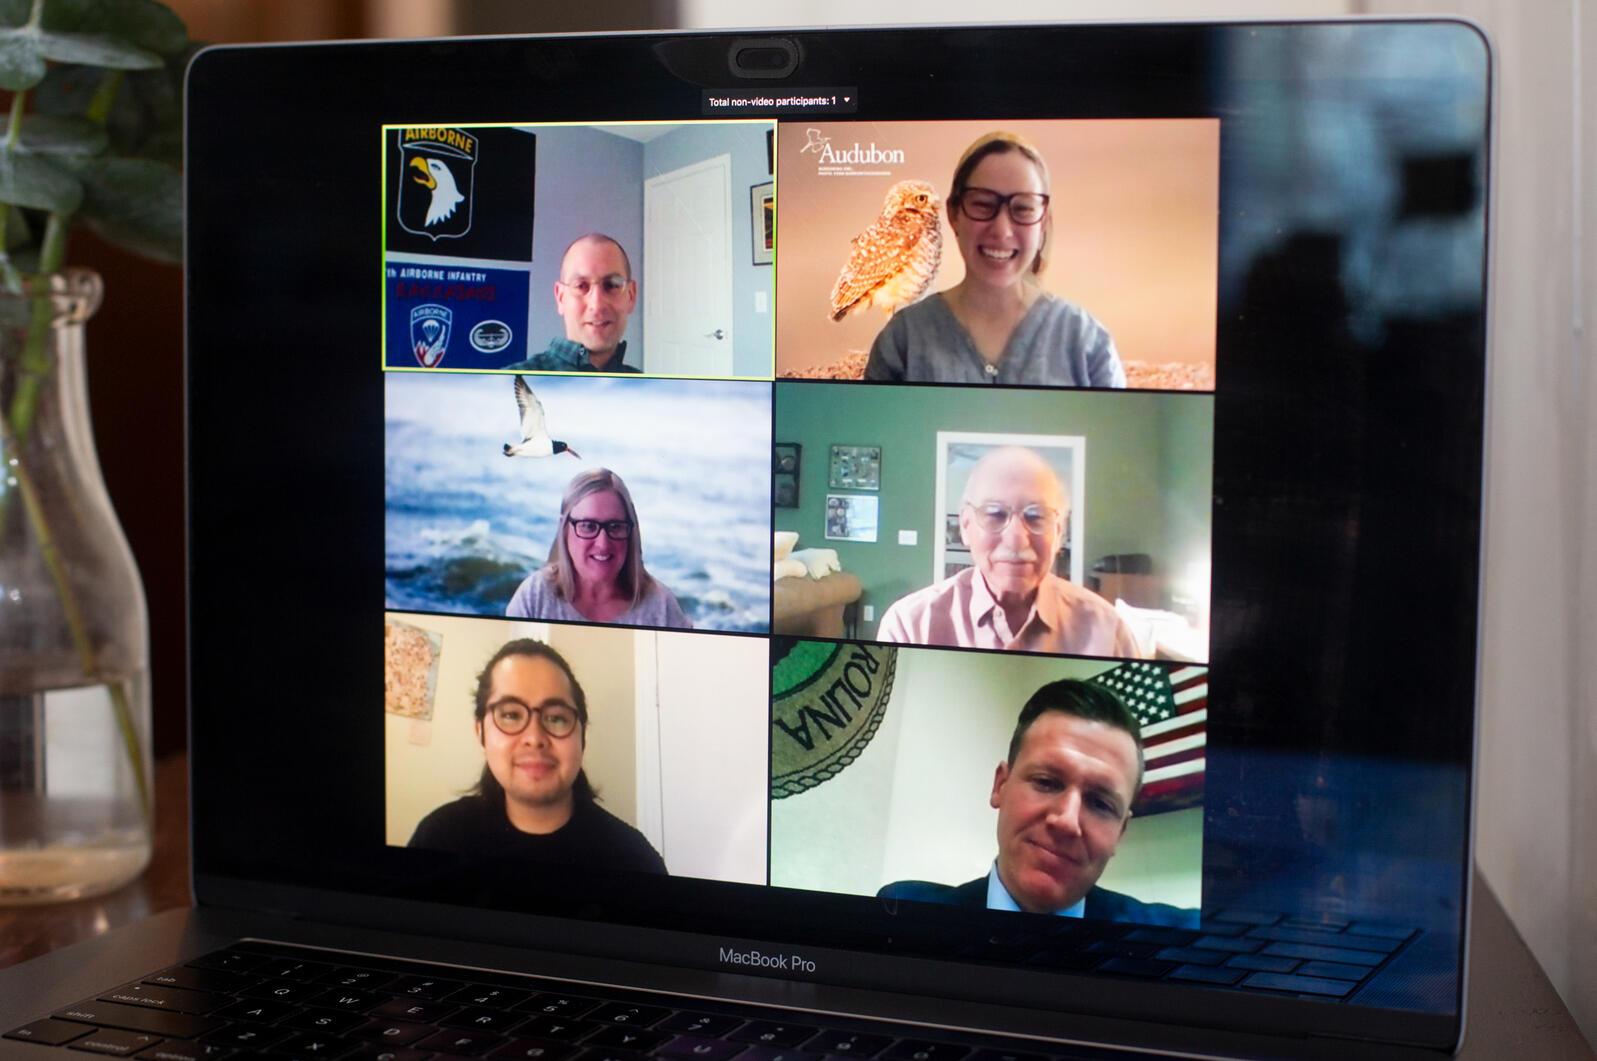 Volunteers with Audubon North Carolina, including Todd Kilb, top left, and Megan Damico, top right, speak with Senator Michael Garrett, bottom right, during the Audubon North Carolina Virtual Advocacy Day. Luke Franke/Audubon